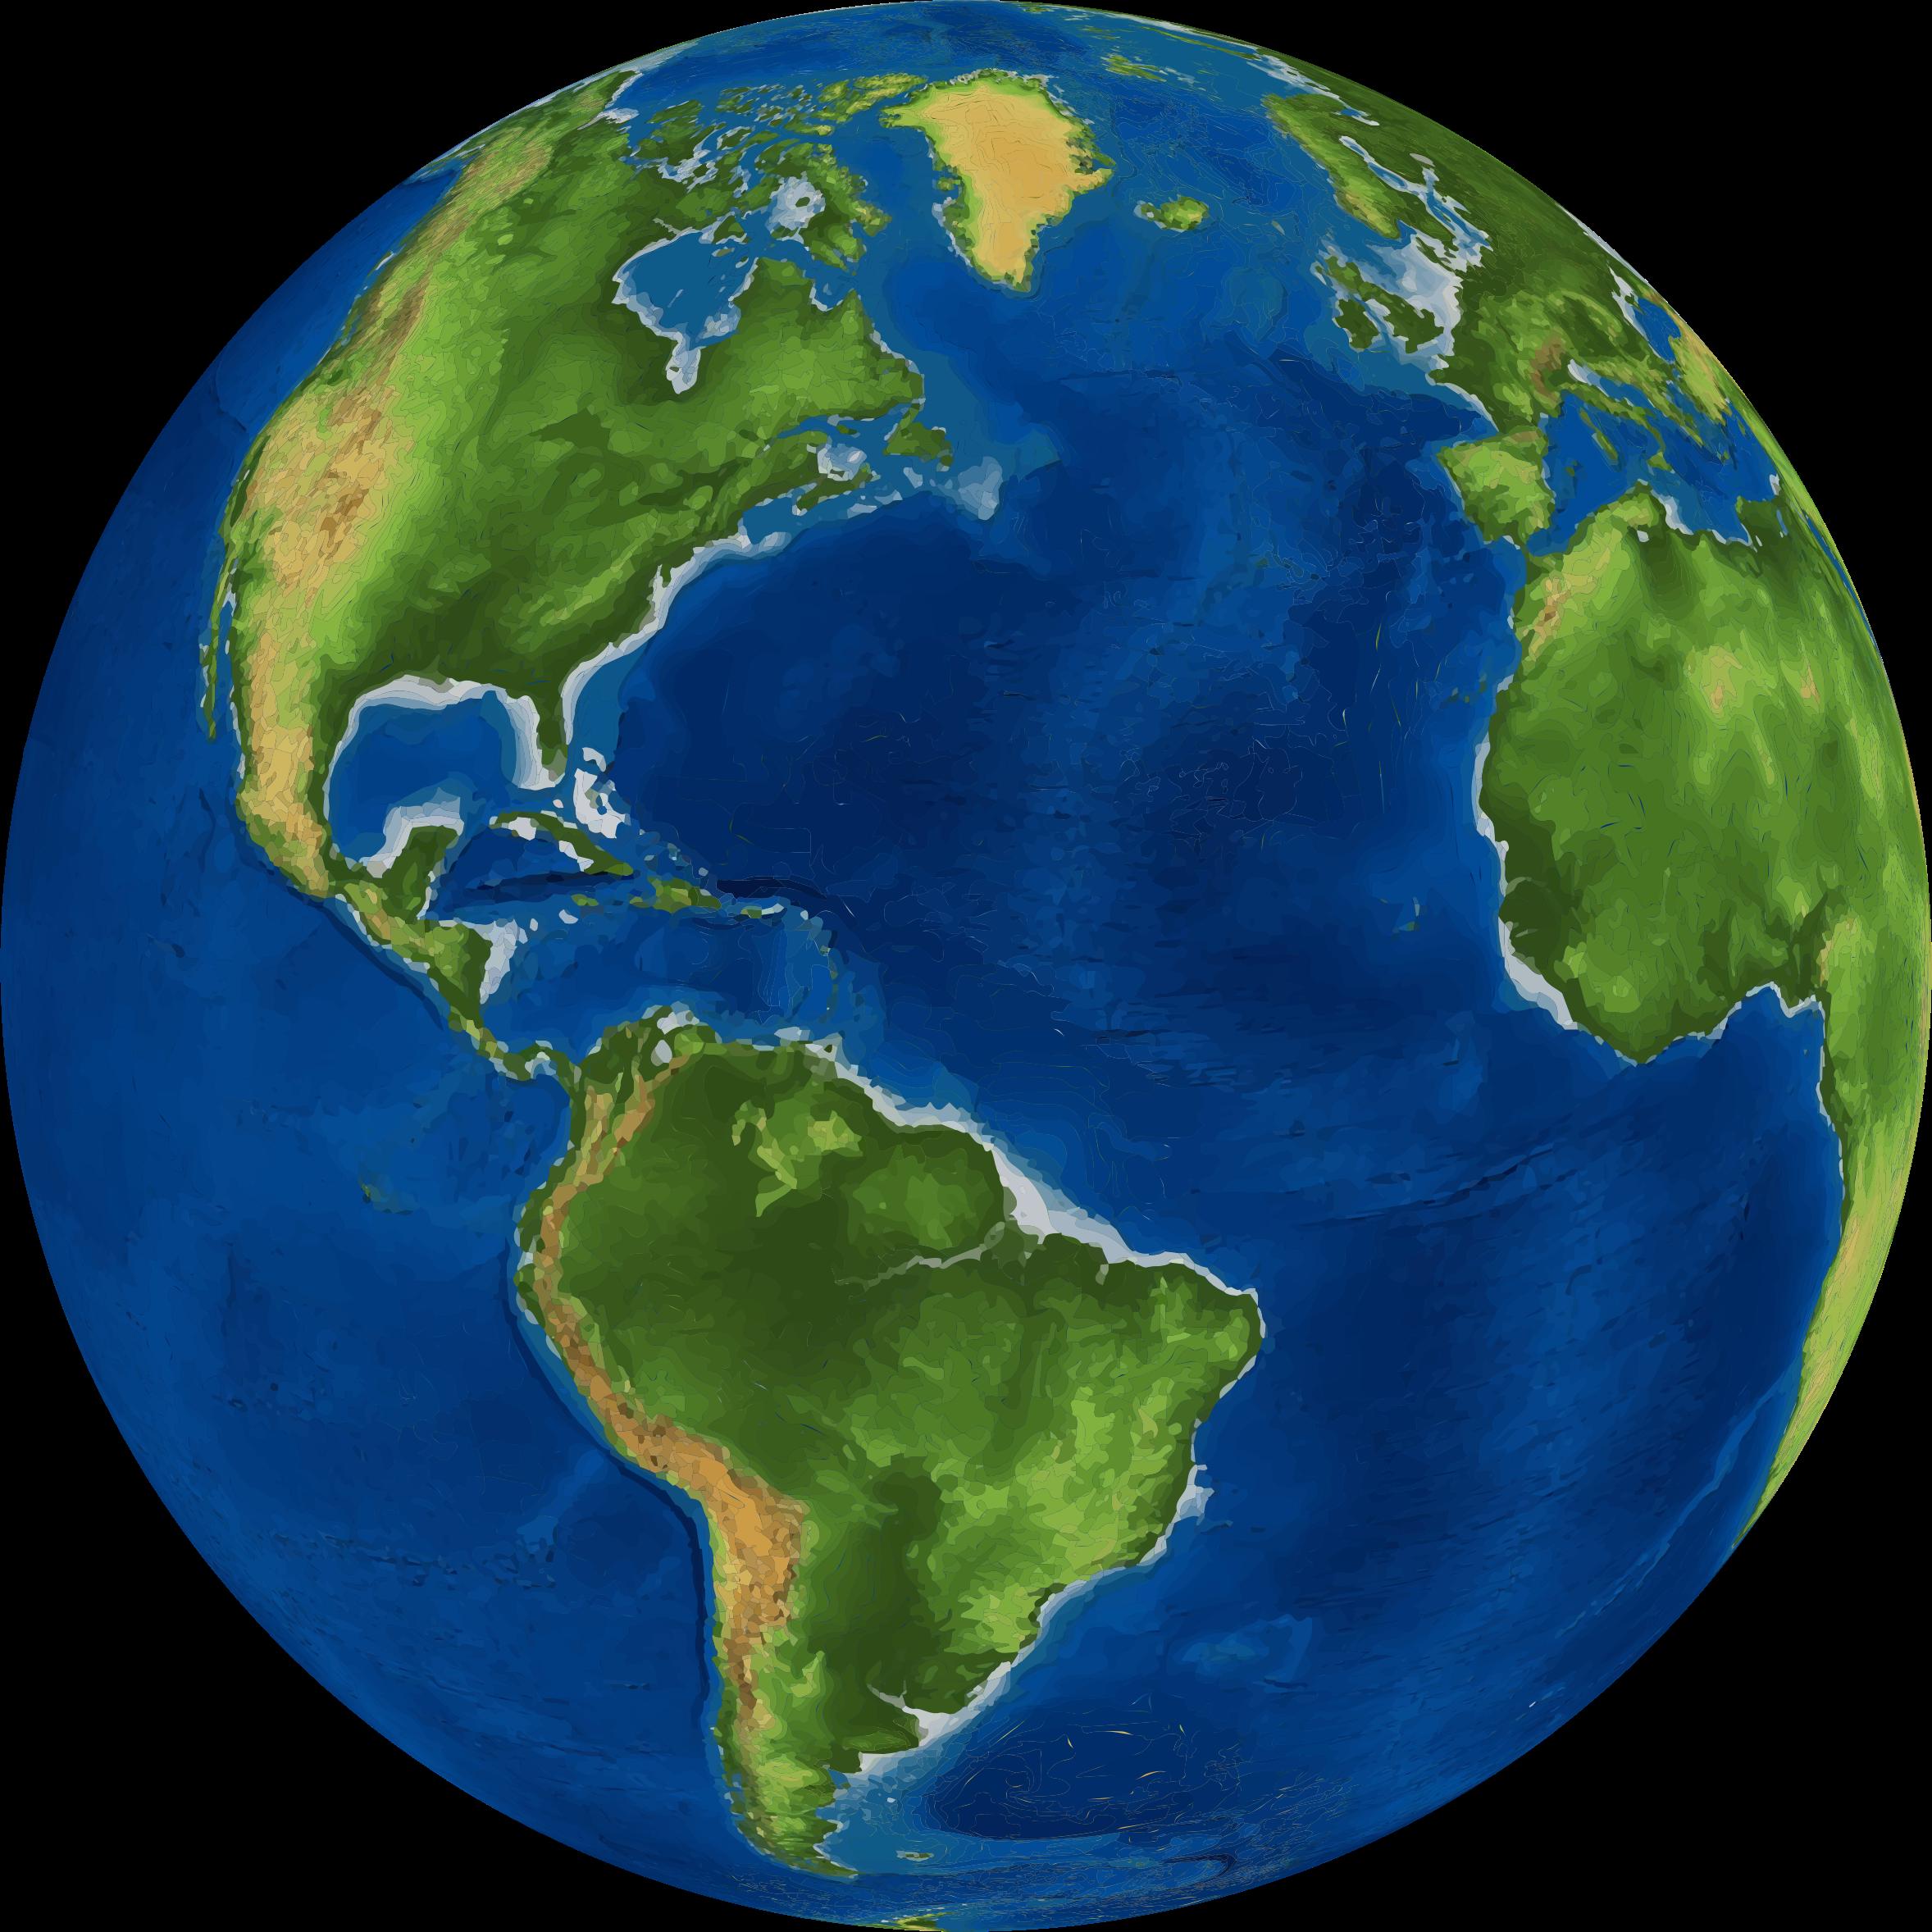 World Outlook in 2021 By Muhammad Omar Iftikhar